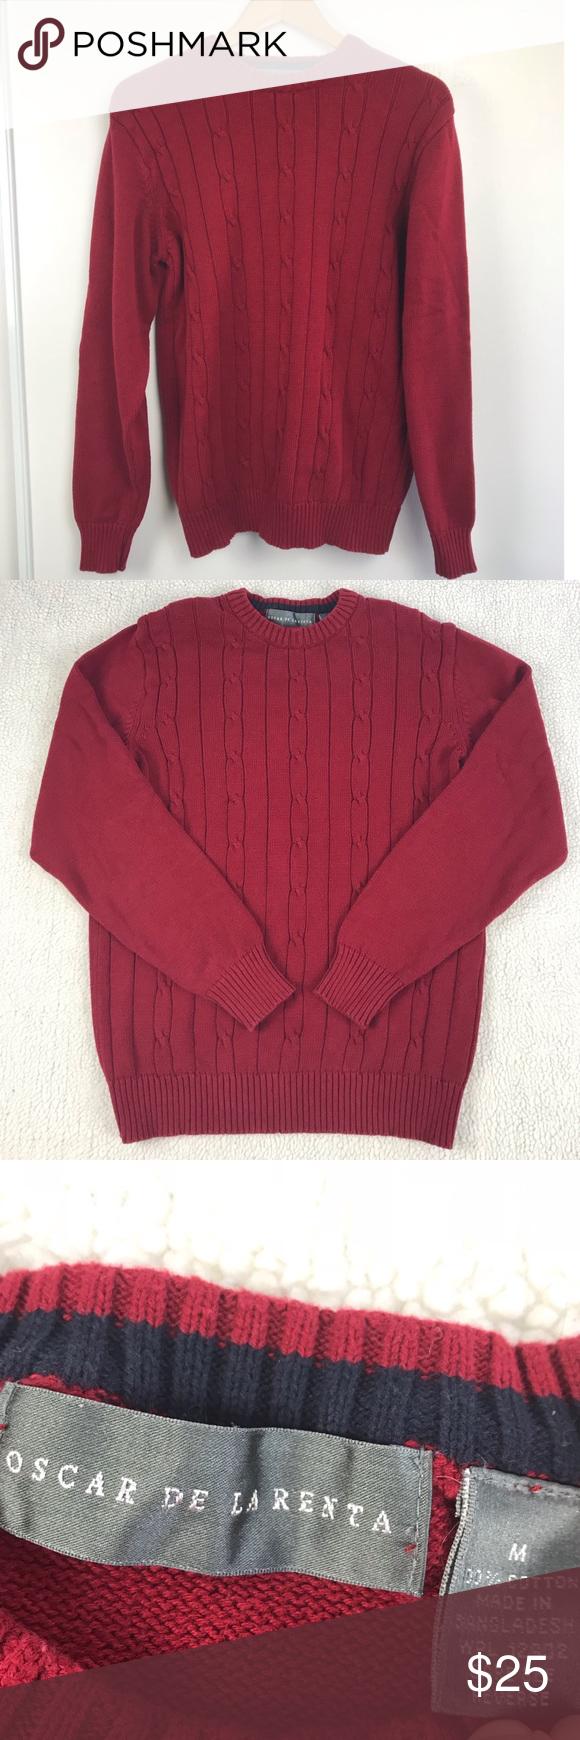 Final Price Oscar De La Renta Mens Sweater My Posh Picks